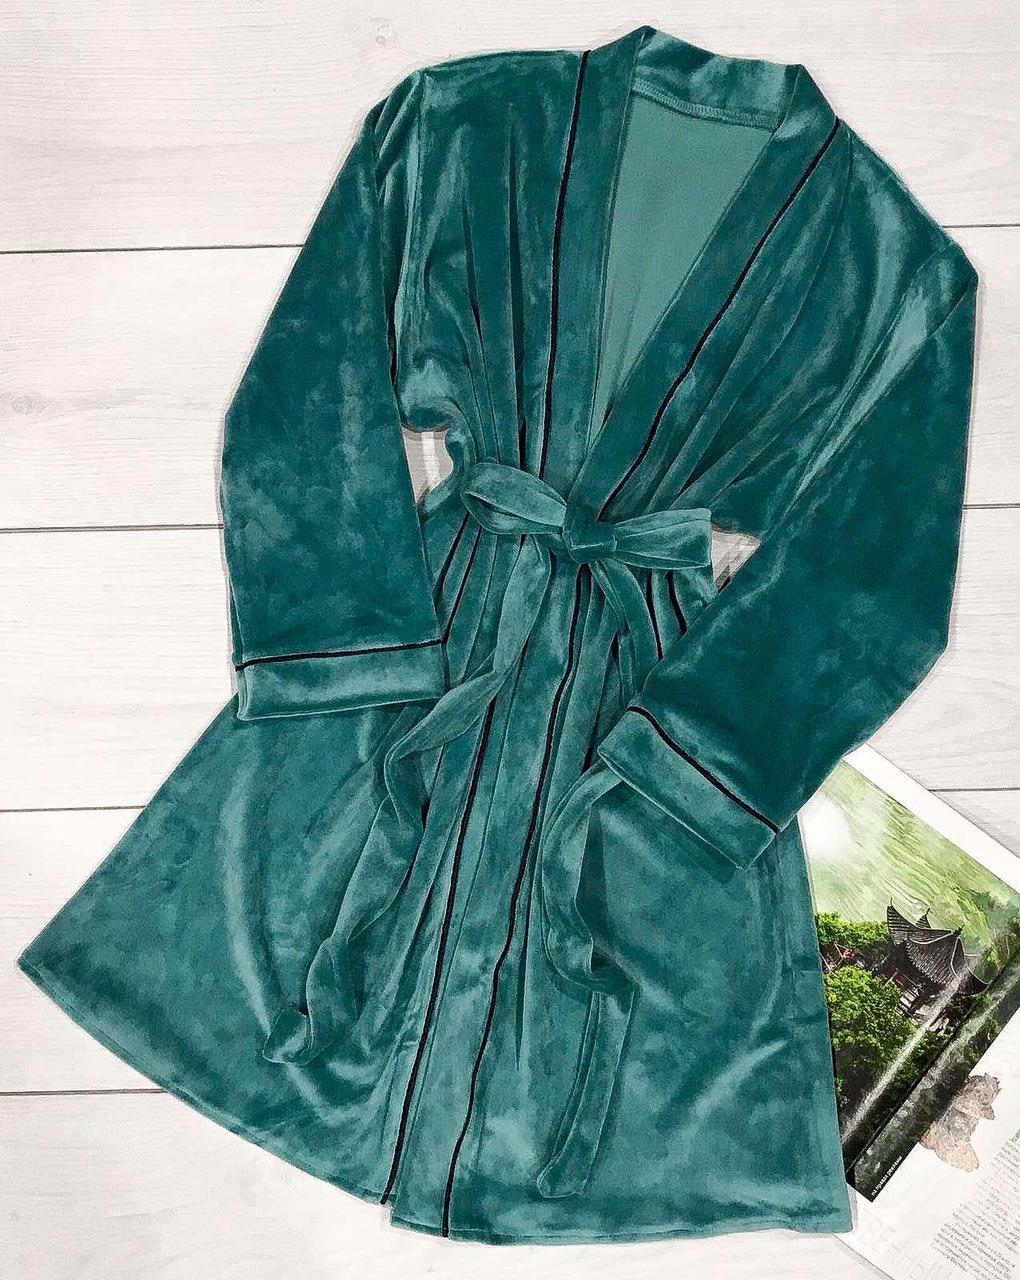 Модный изумрудный халат женский, теплый халат.